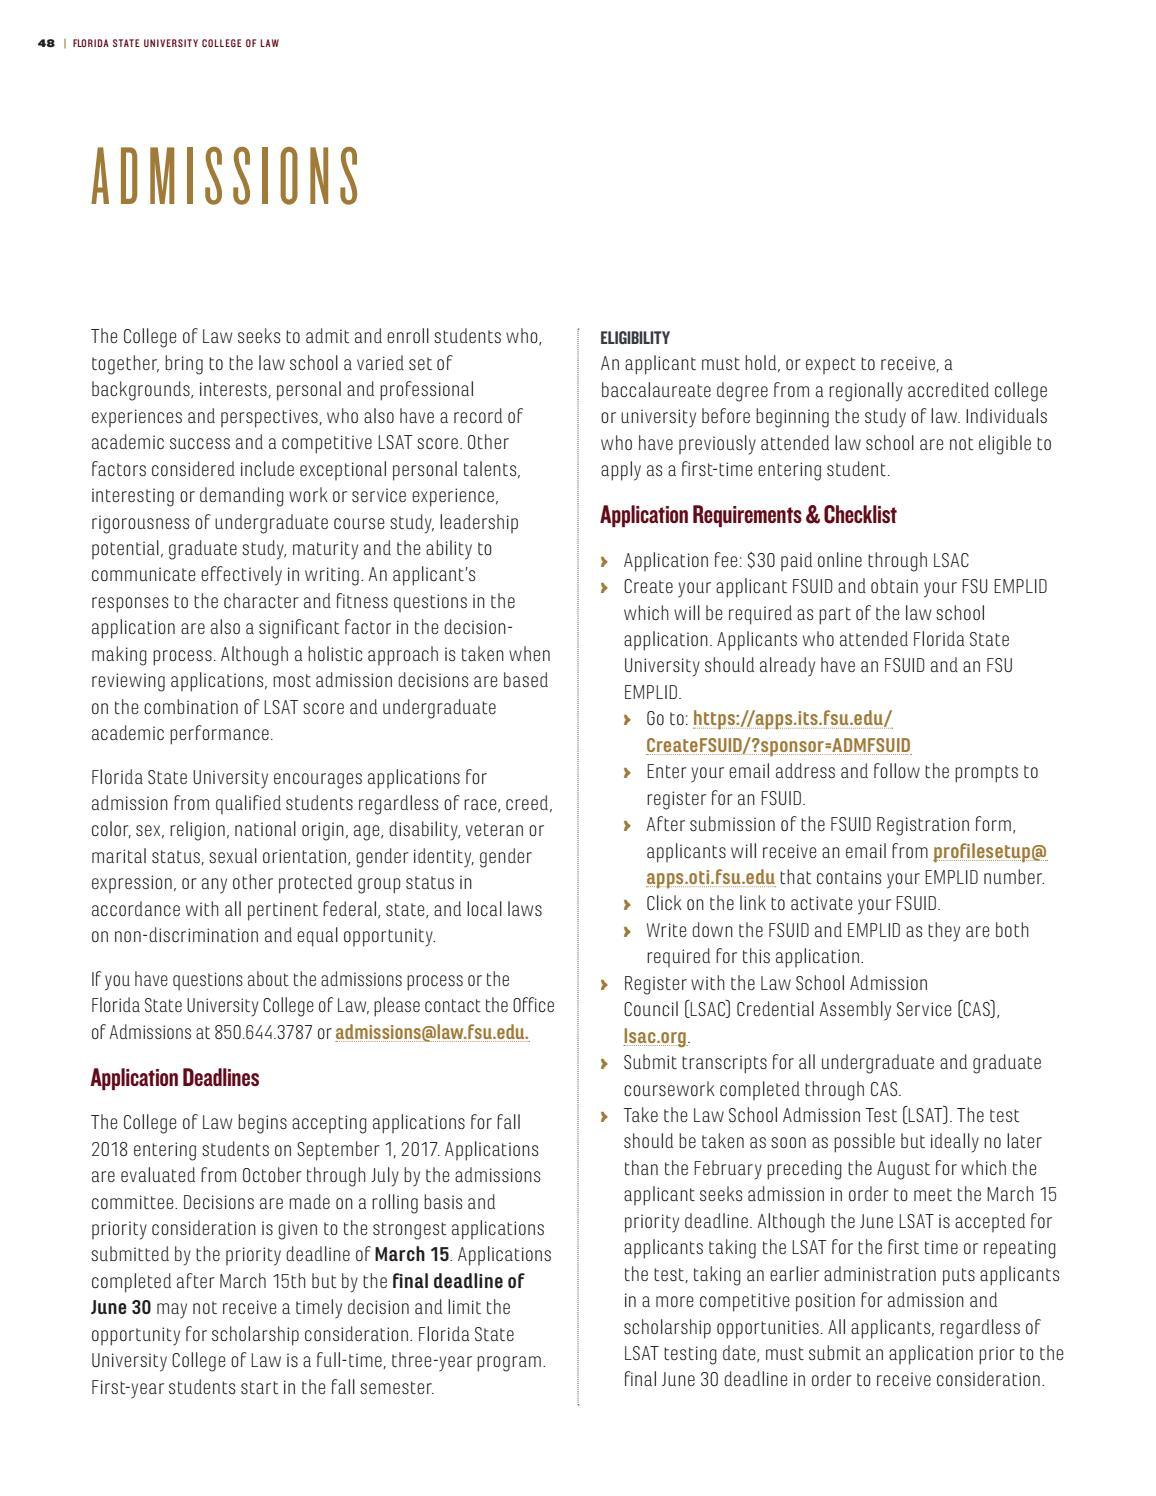 FSU College of Law 2017-2018 Viewbook by Florida State